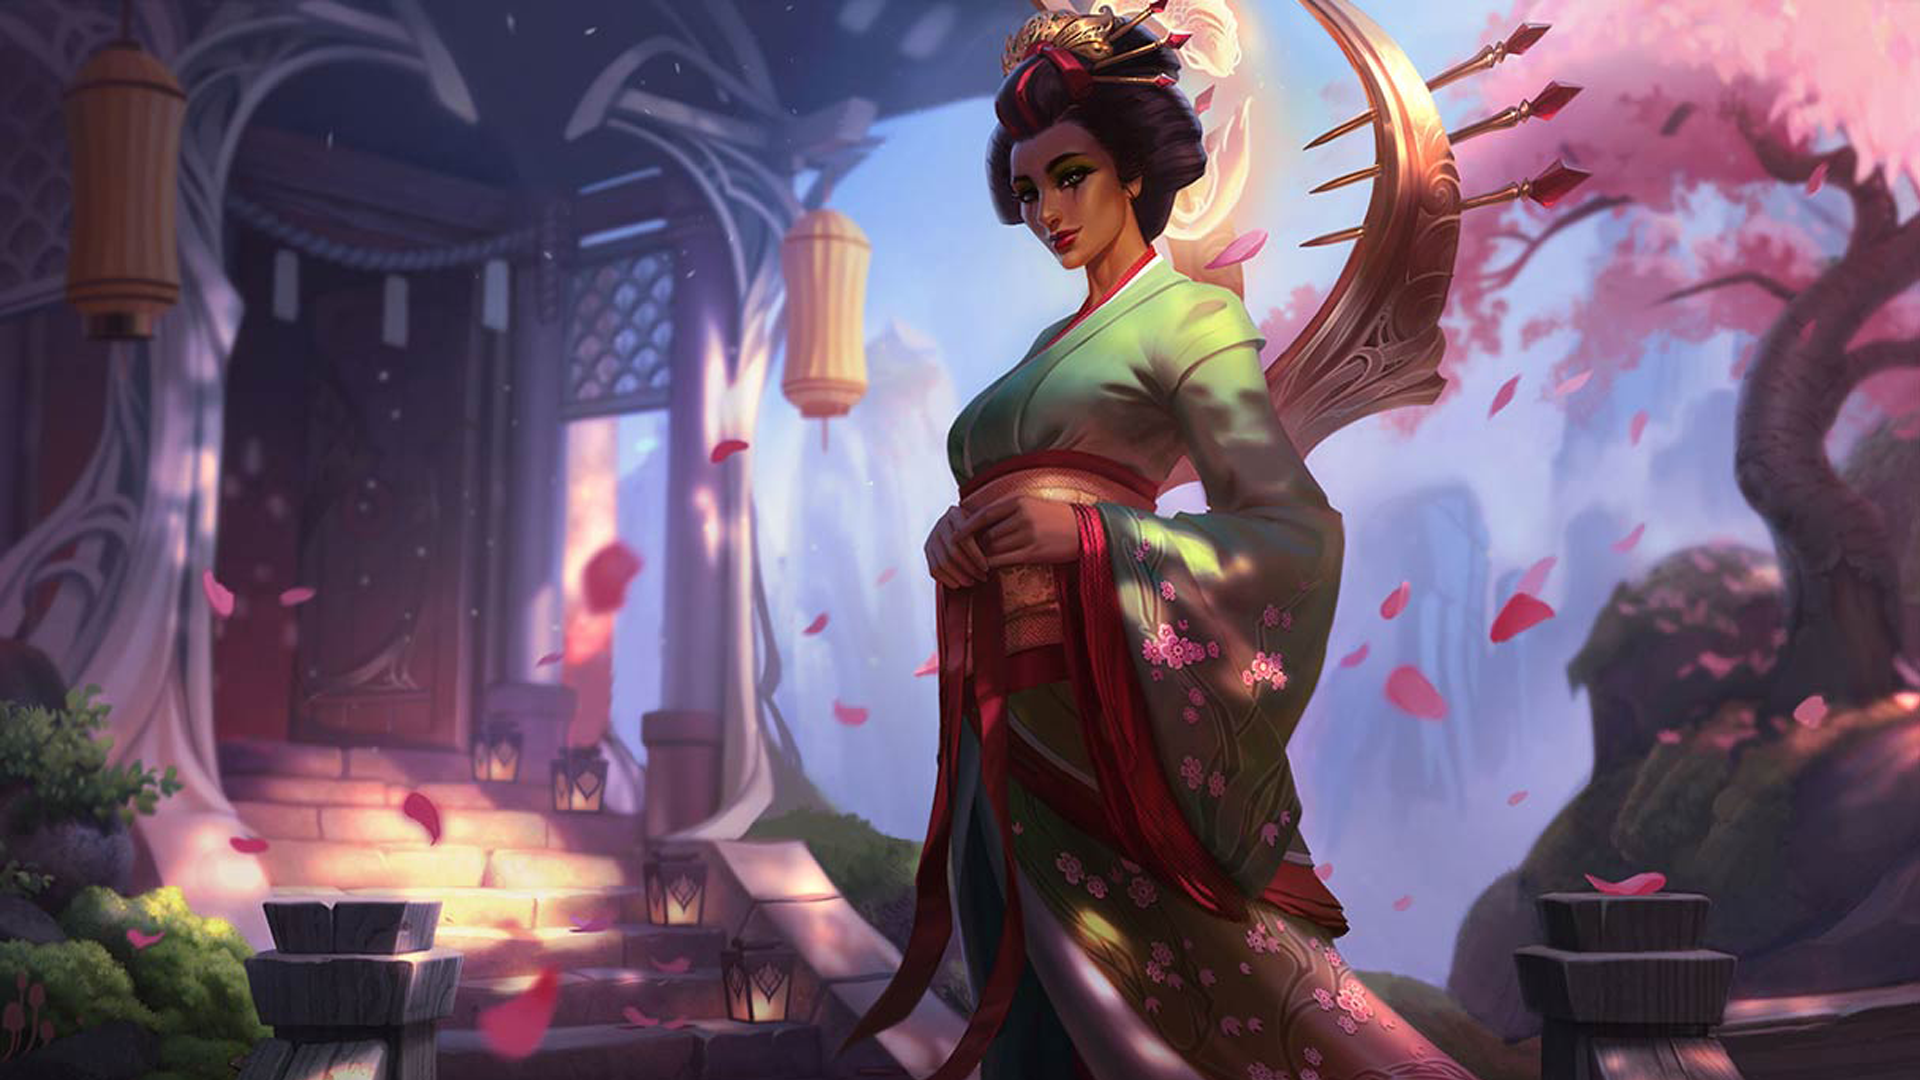 General 1920x1080 Karma (League of Legends) Summoner's Rift League of Legends fantasy girl fantasy art video game girls PC gaming hanfu